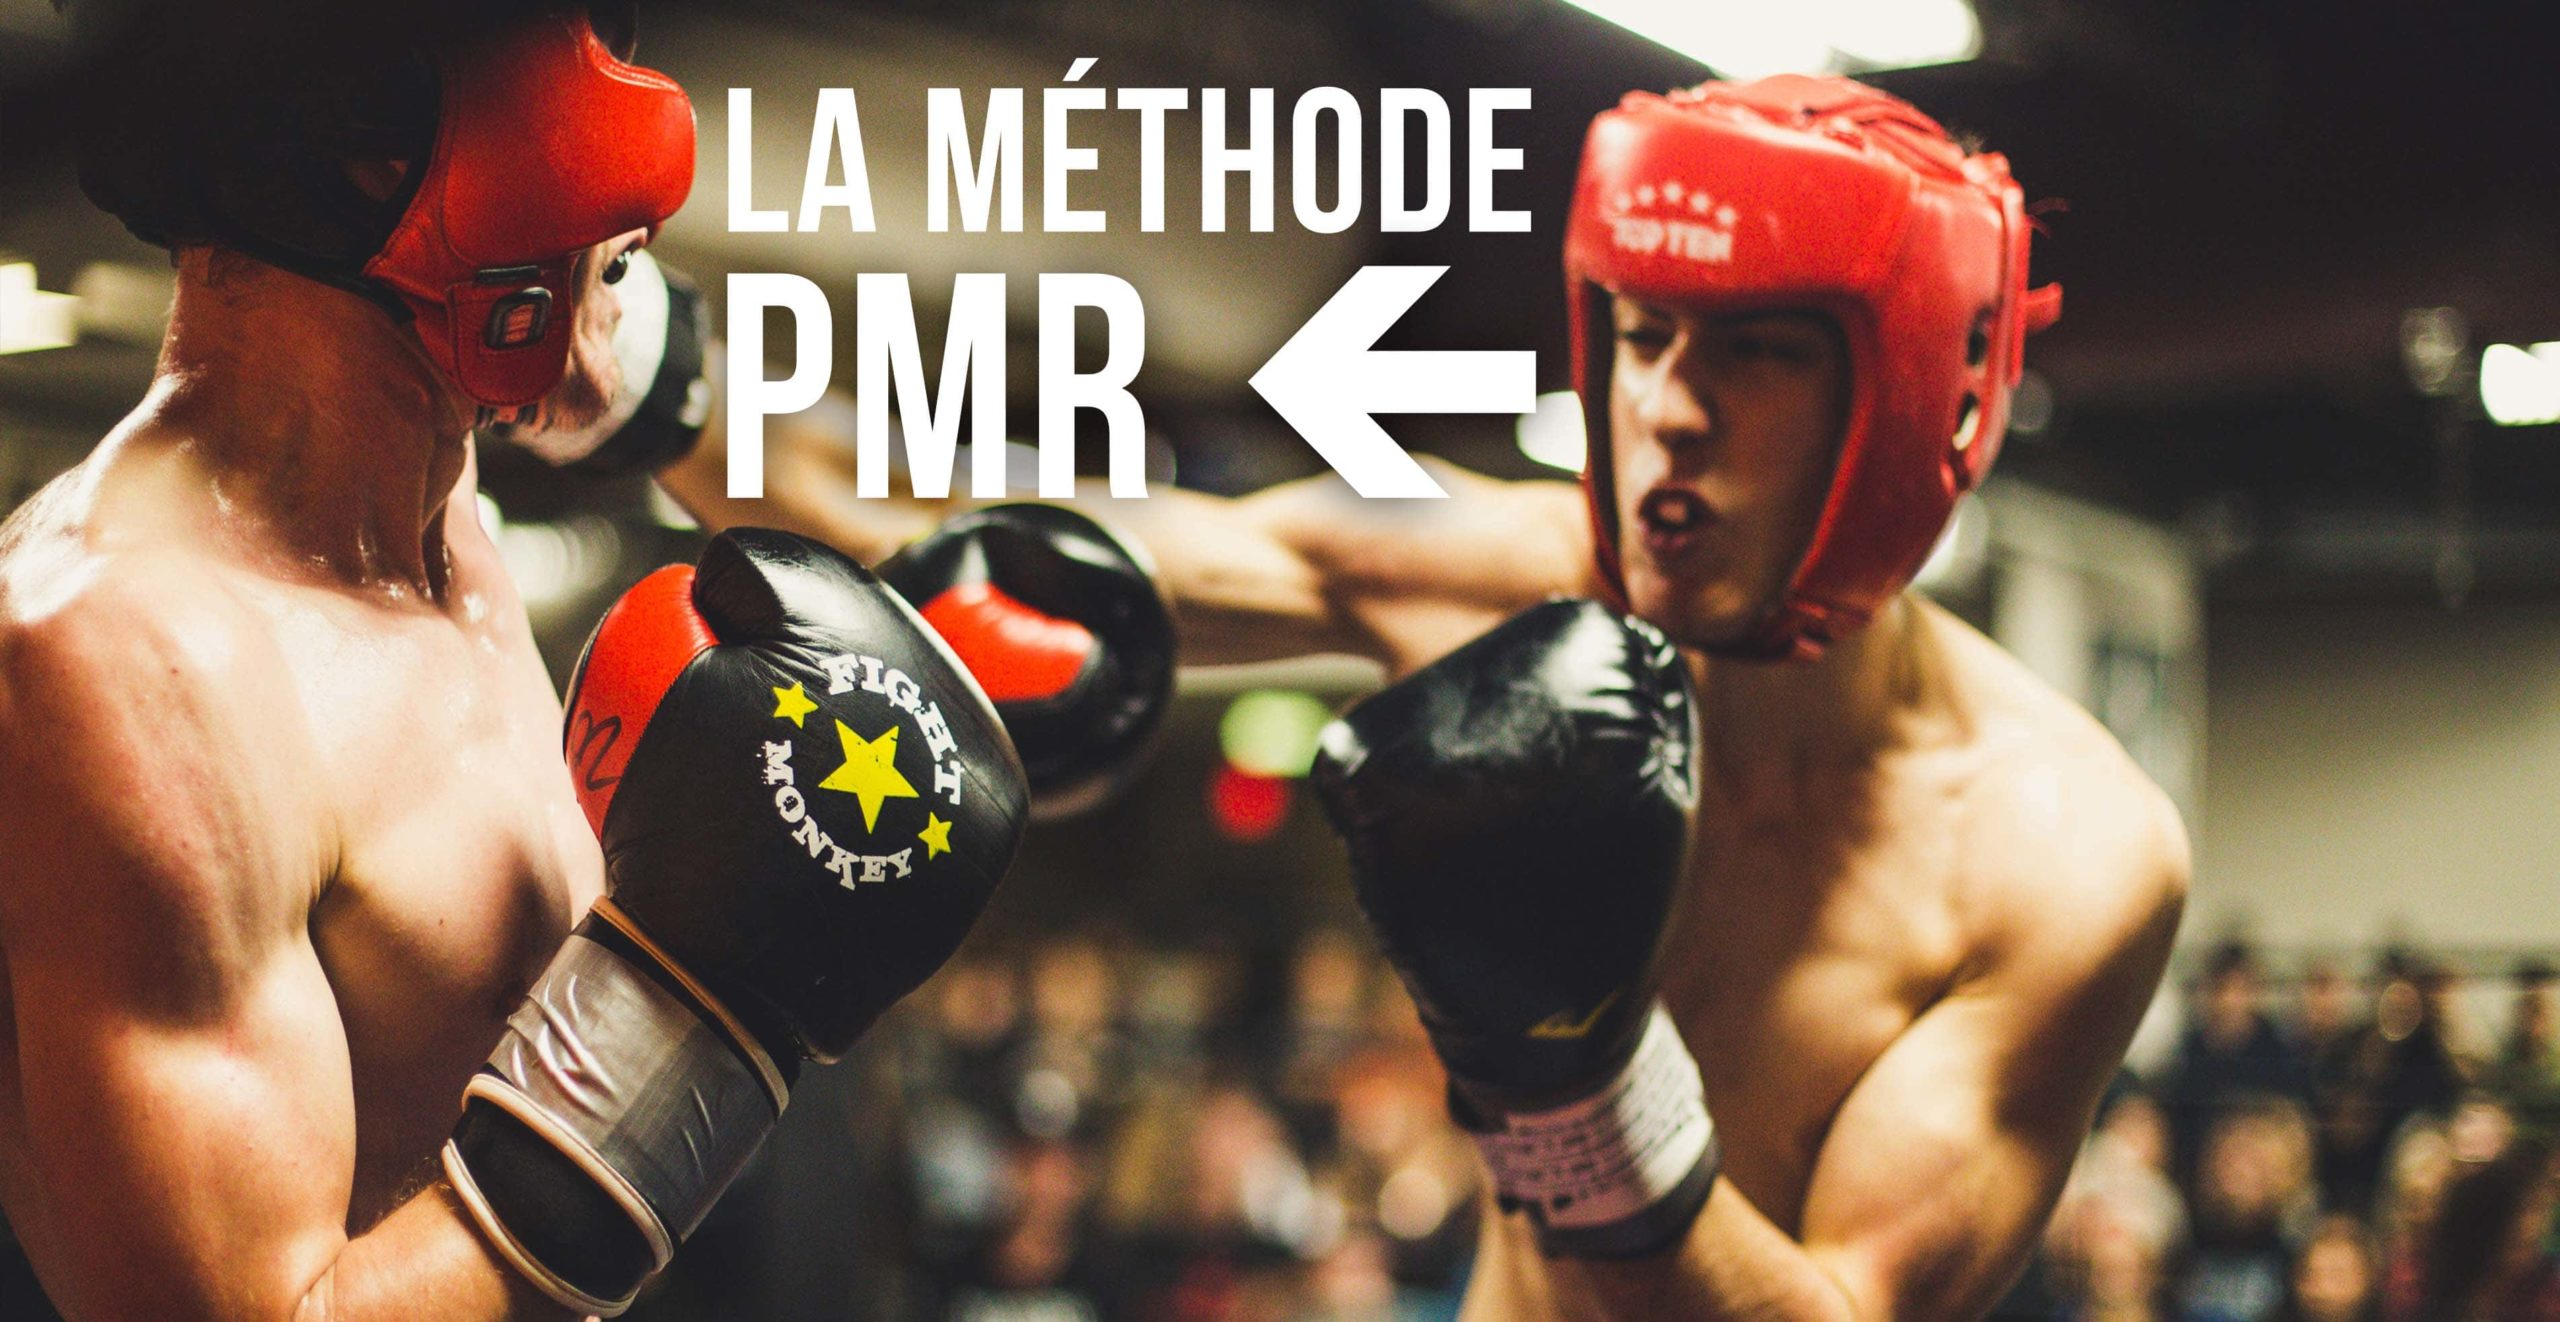 méthode pmr